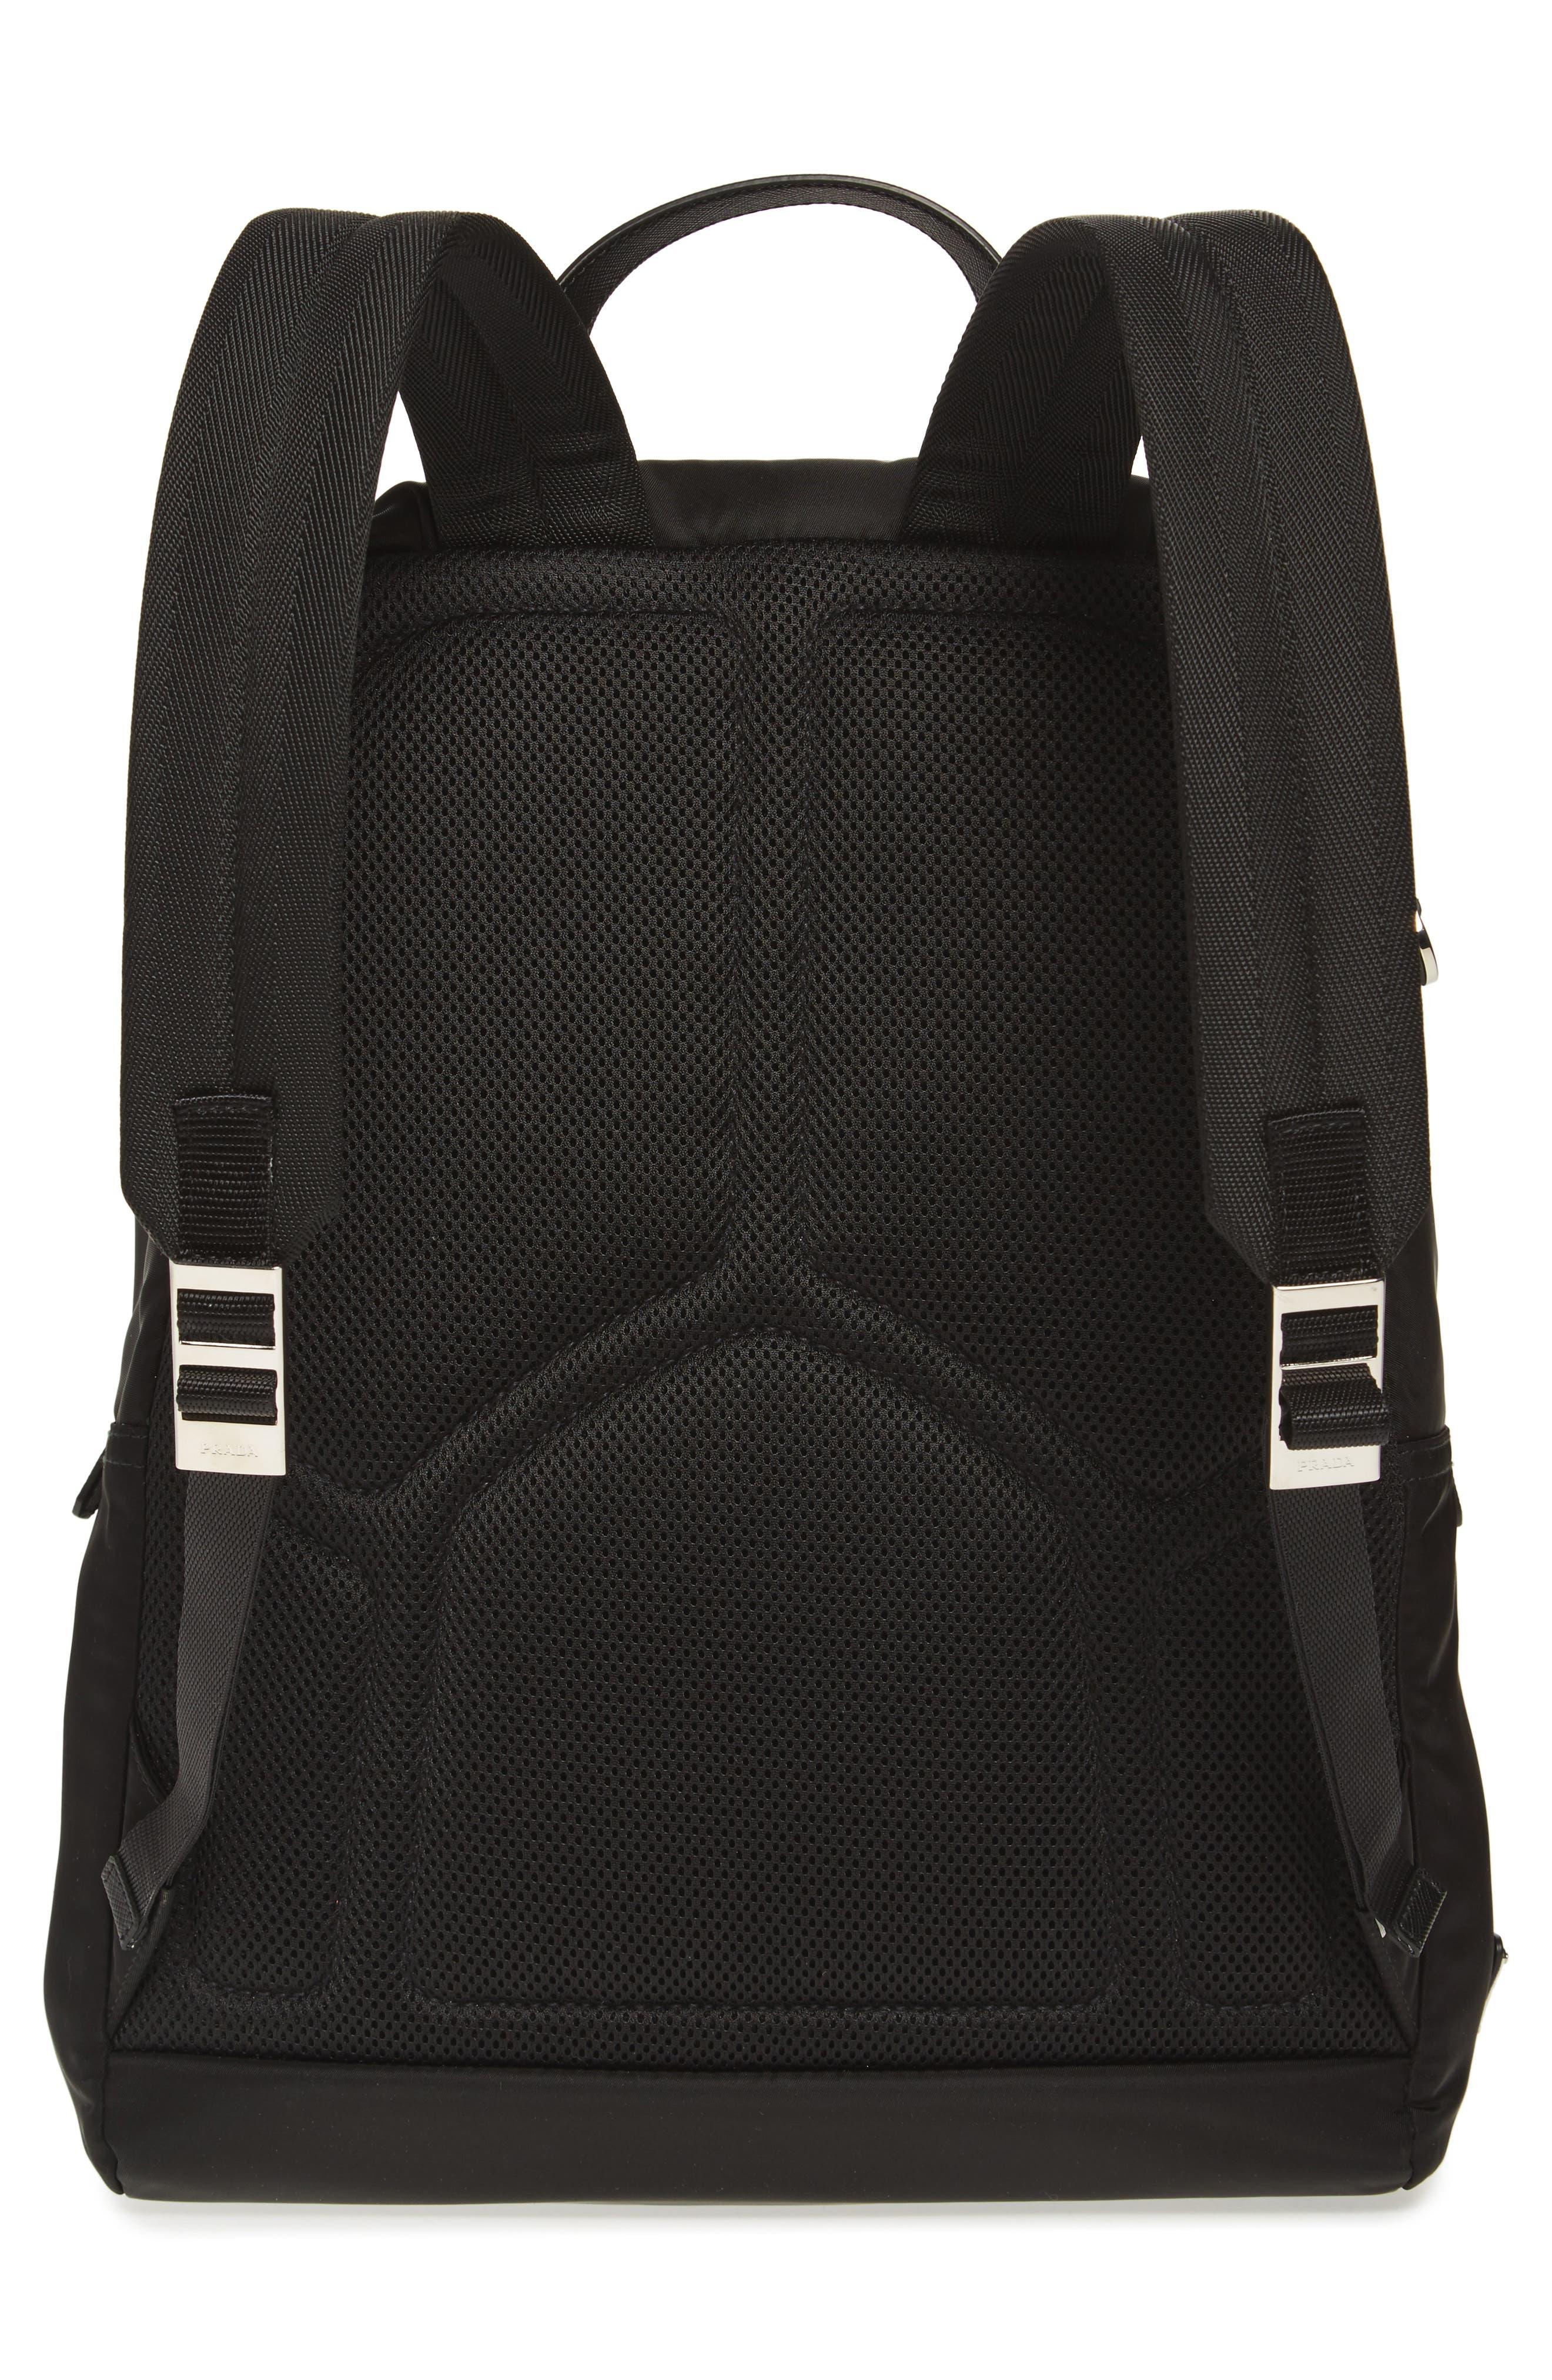 Robot Backpack,                             Alternate thumbnail 3, color,                             F0g52 Nero+Baltic